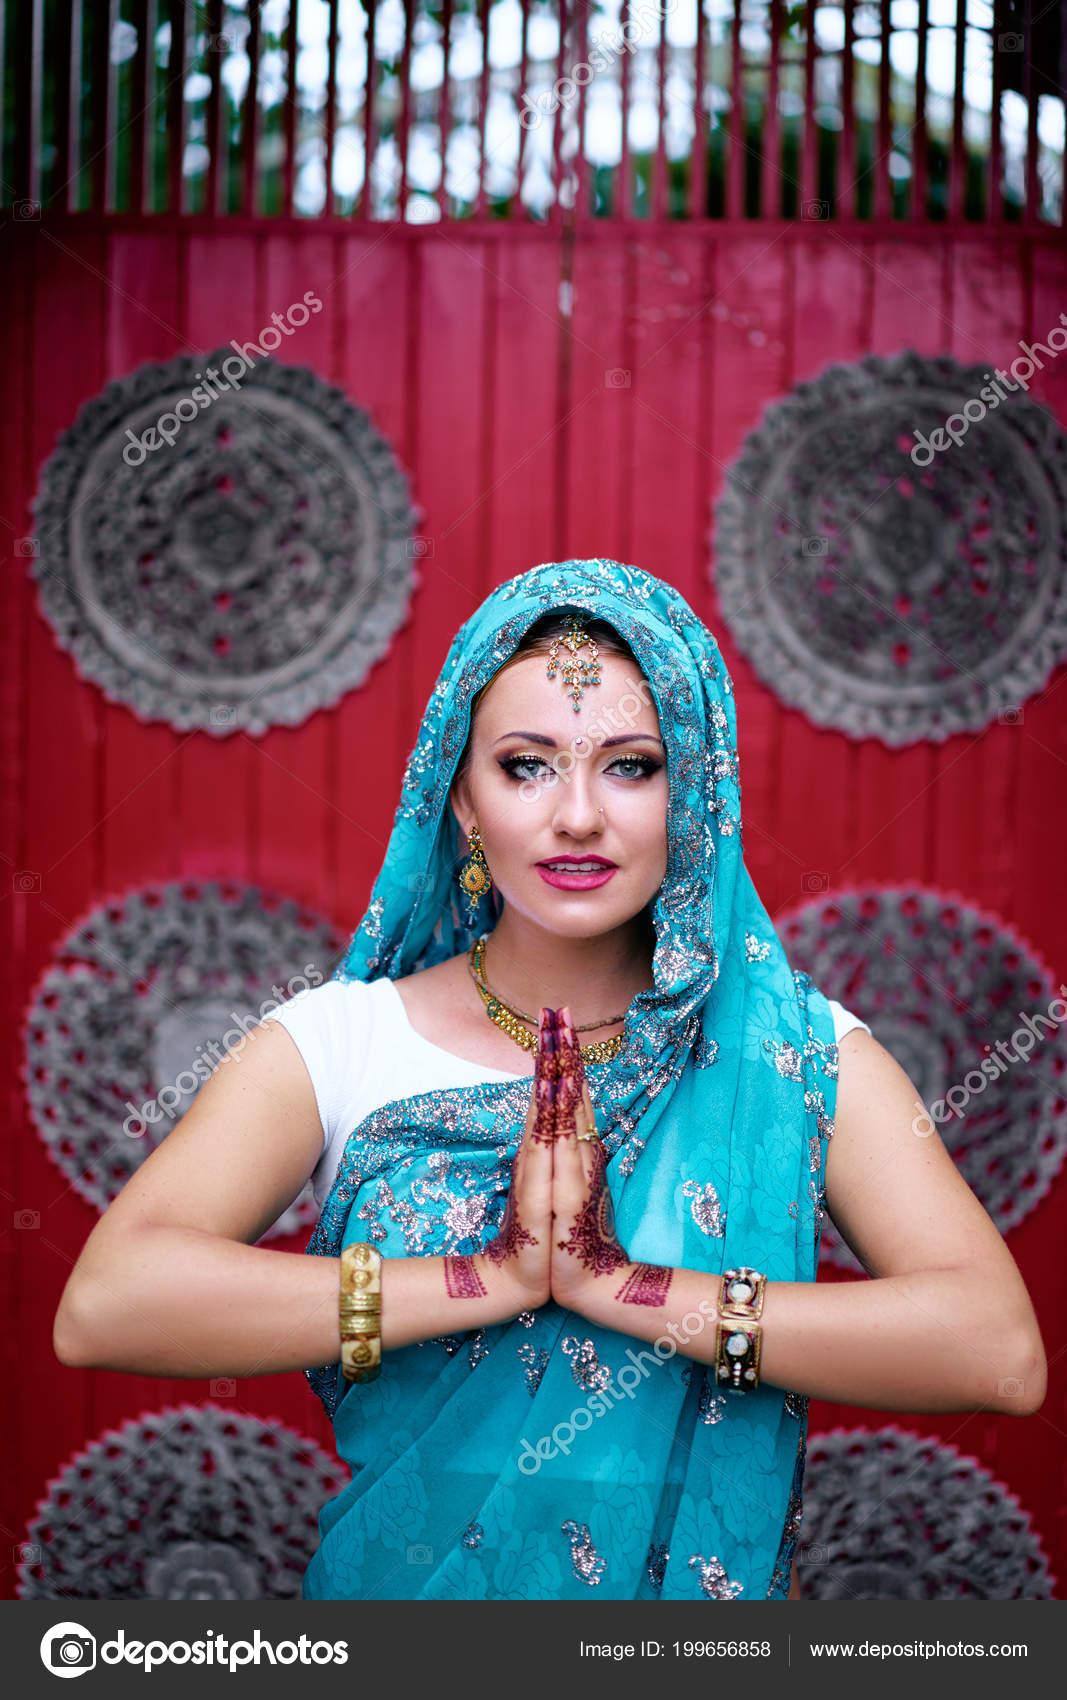 Beautiful Young Caucasian Woman Traditional Indian Clothing